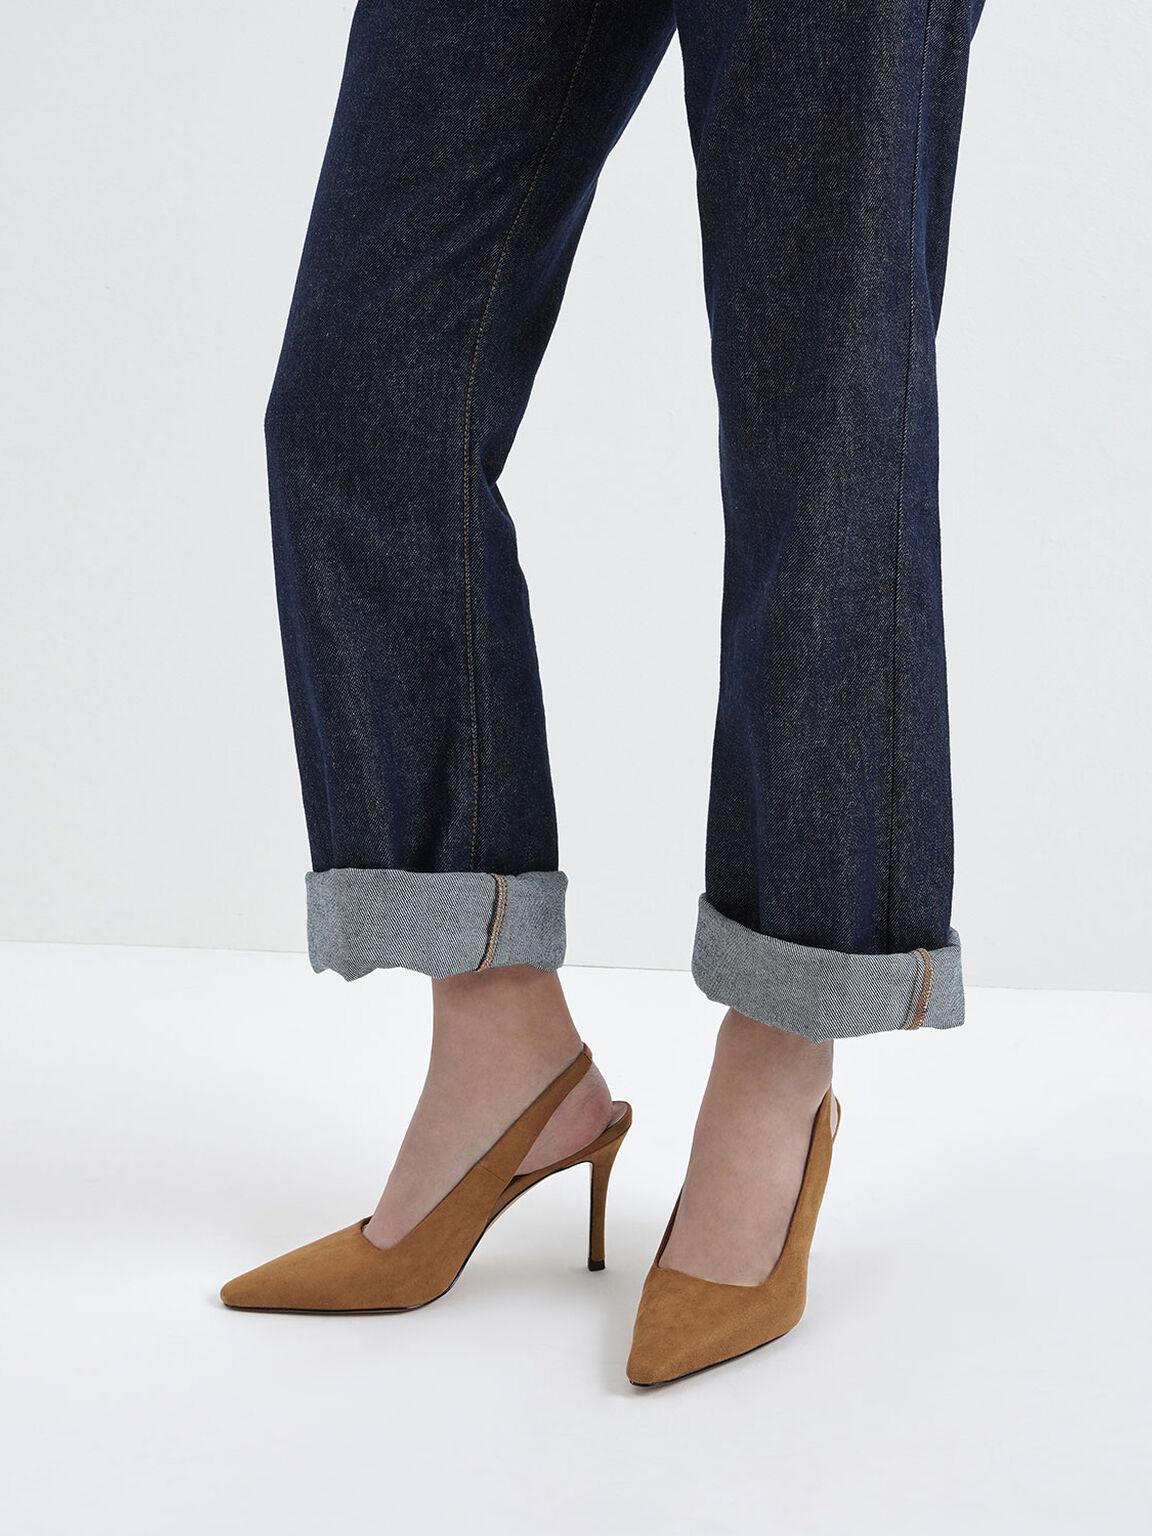 Textured Stiletto Heel Slingback Pumps, Caramel, hi-res